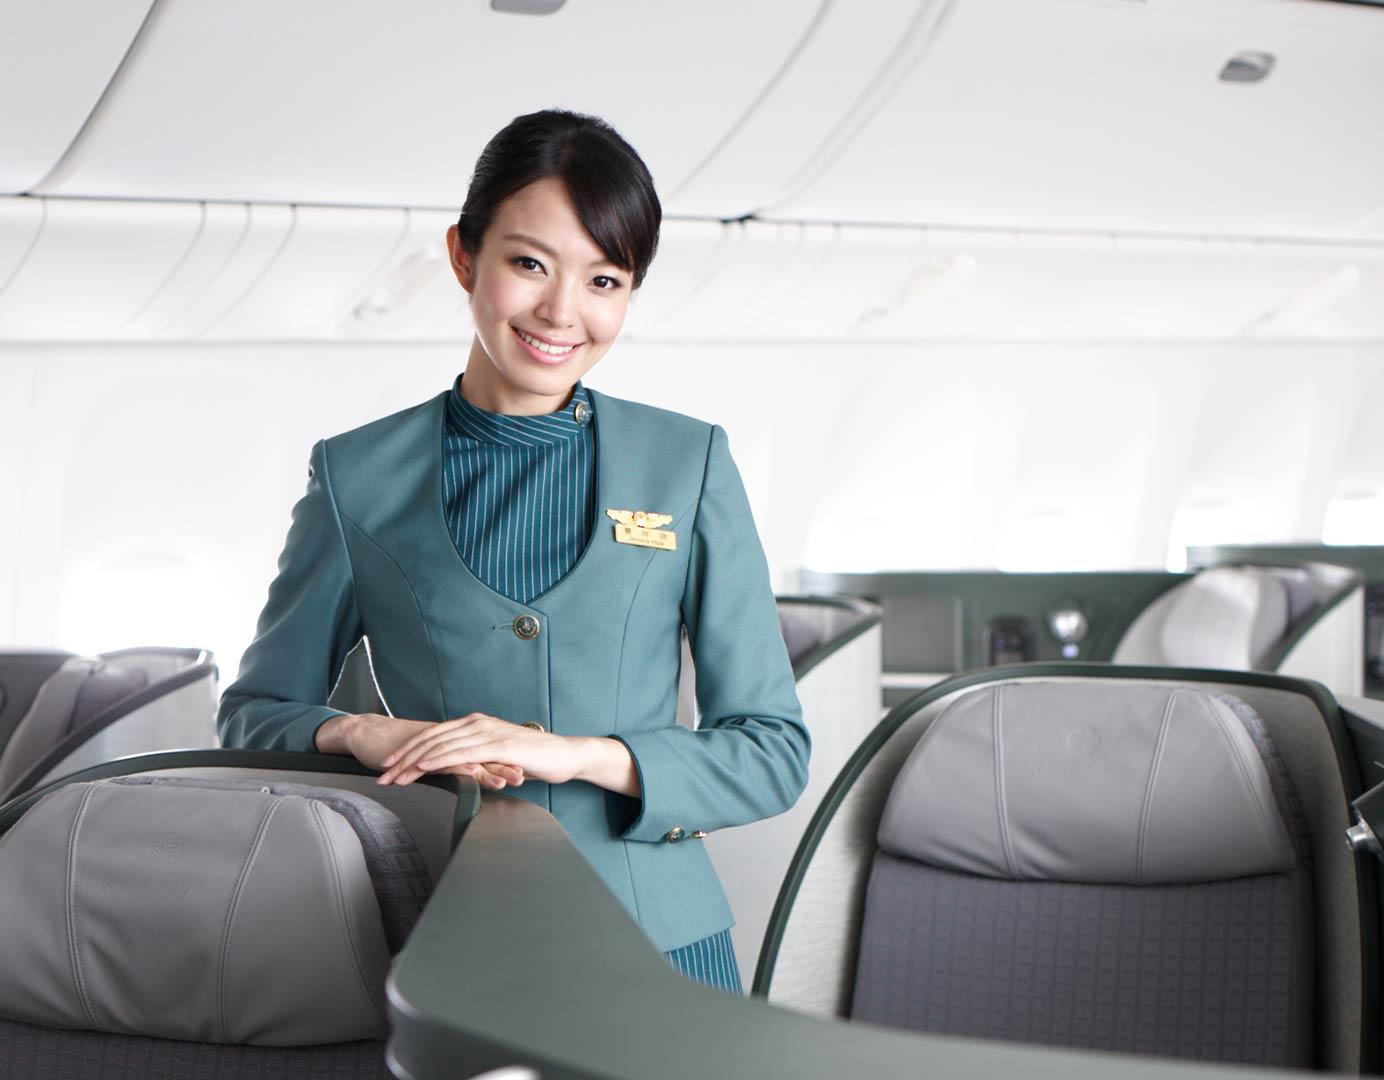 Vé Máy Bay Eva Air Đi Salt Lake City Chỉ 363 USD